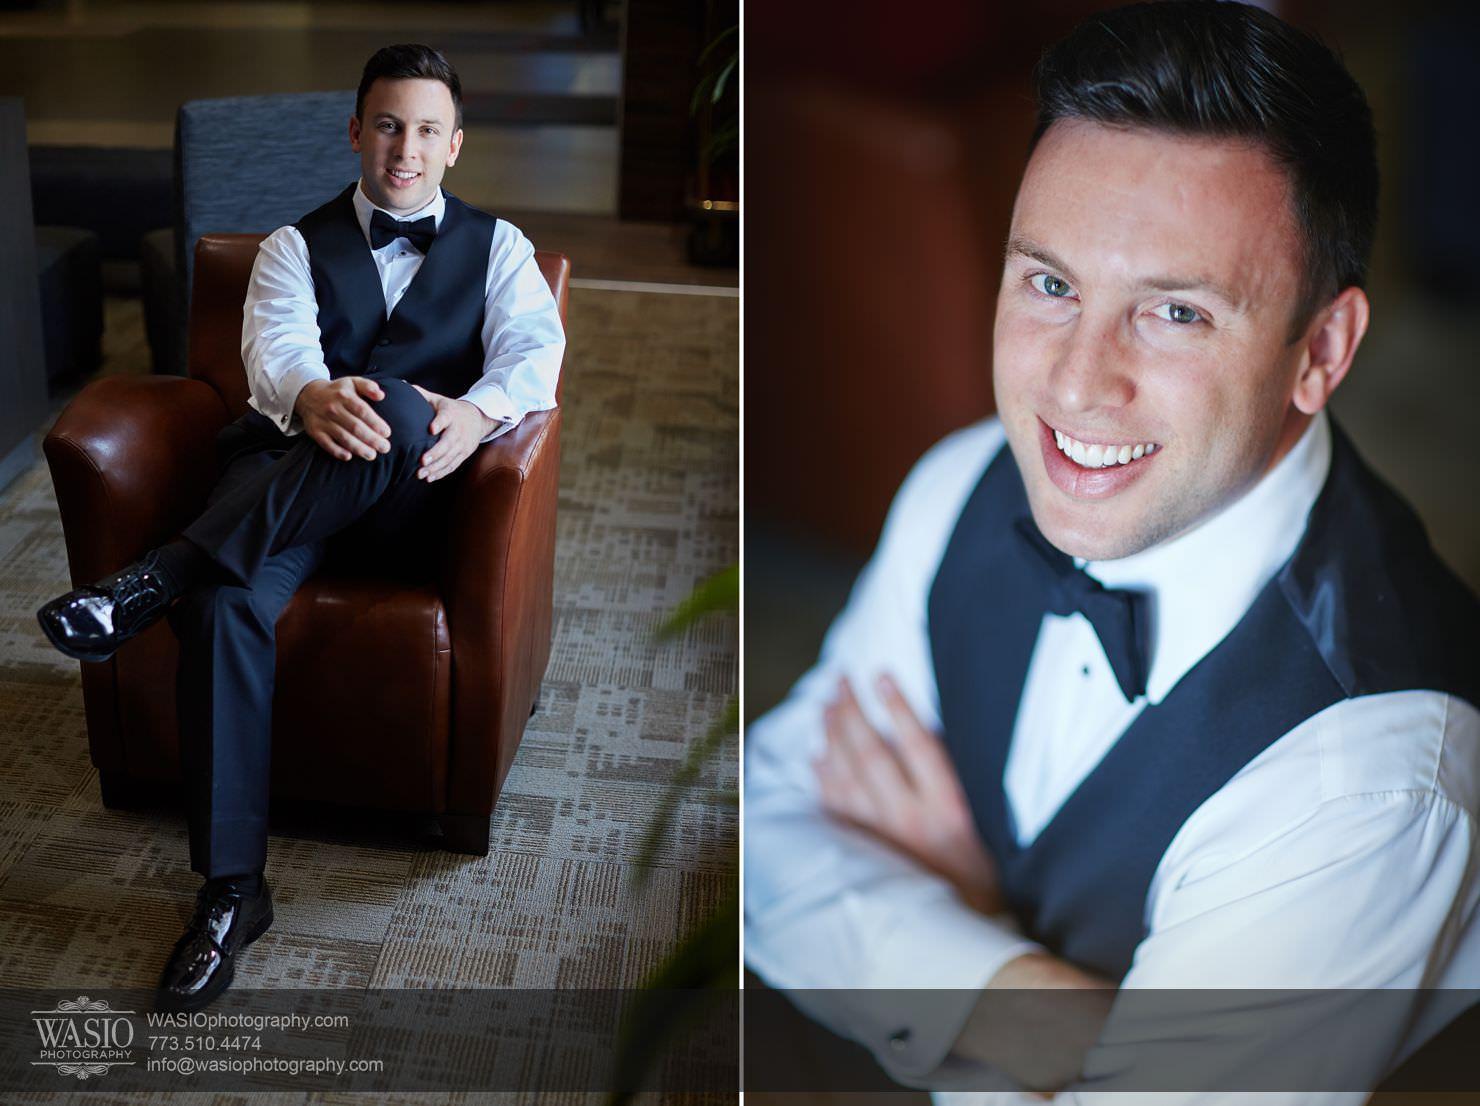 014_Chicago-Spring-Wedding_Chrissy-Andrew_0O3A1595-copy Chicago Spring Wedding - Chrissy + Andrew